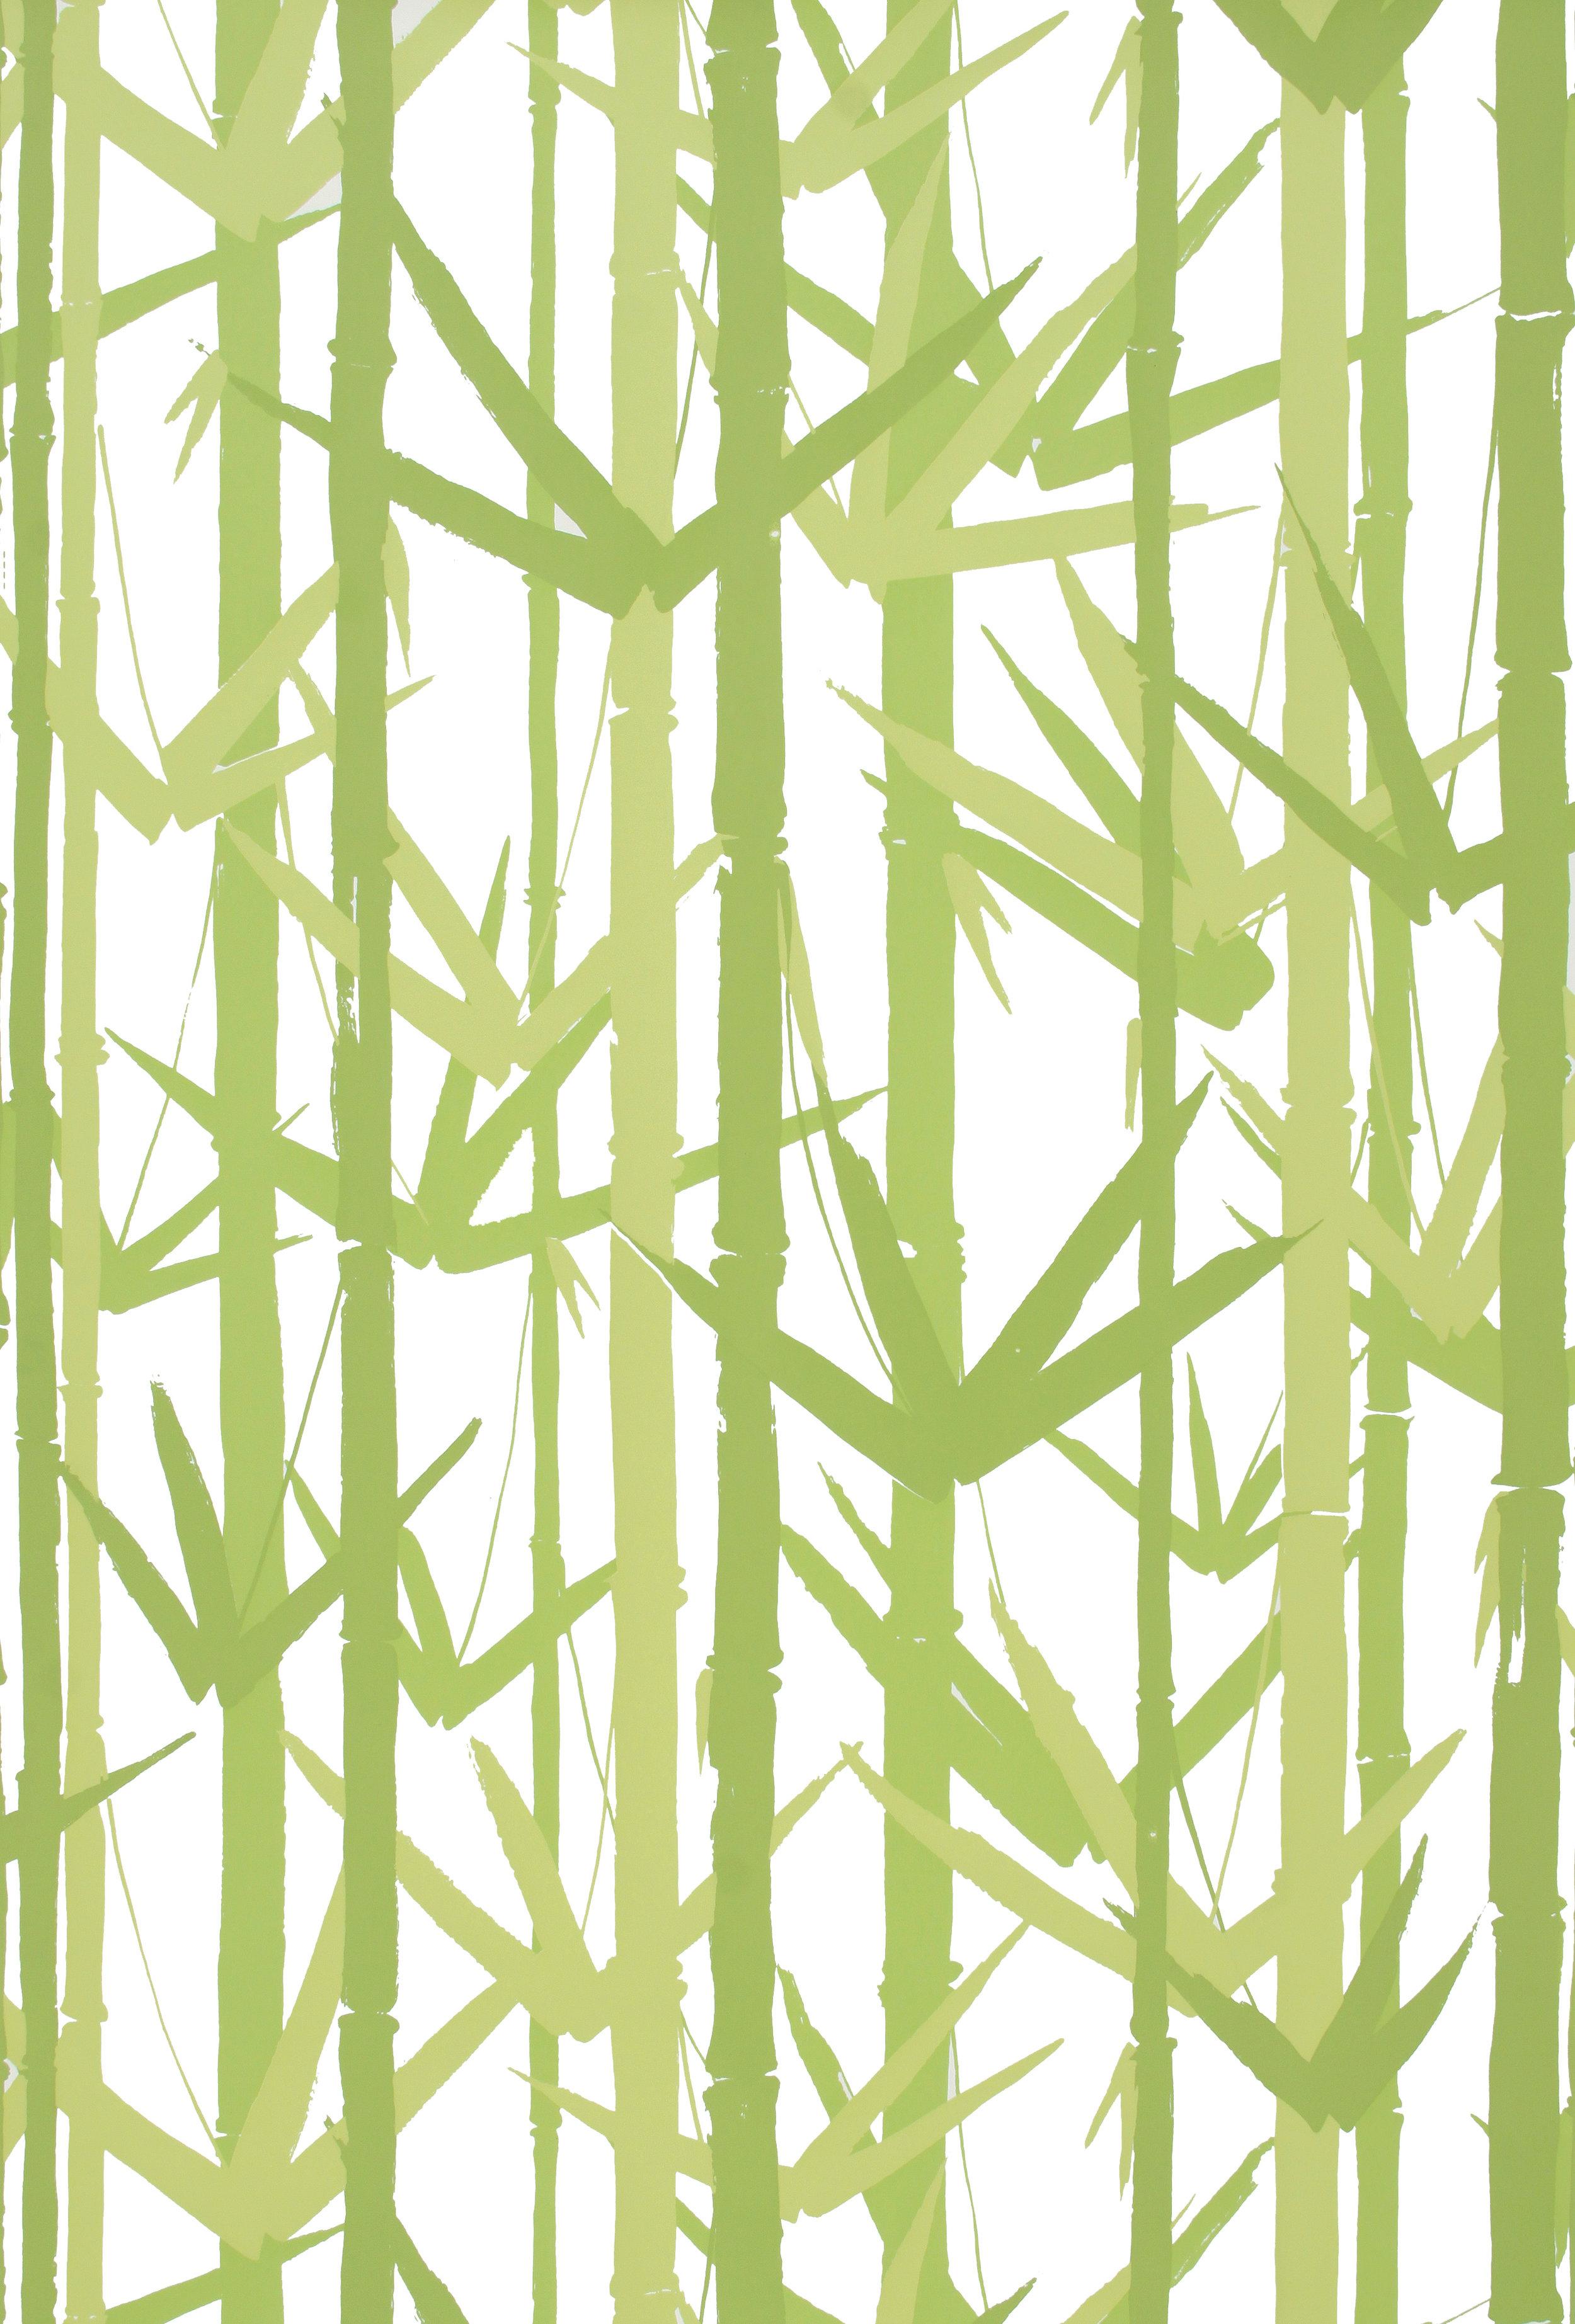 bamboo-garden green.jpg